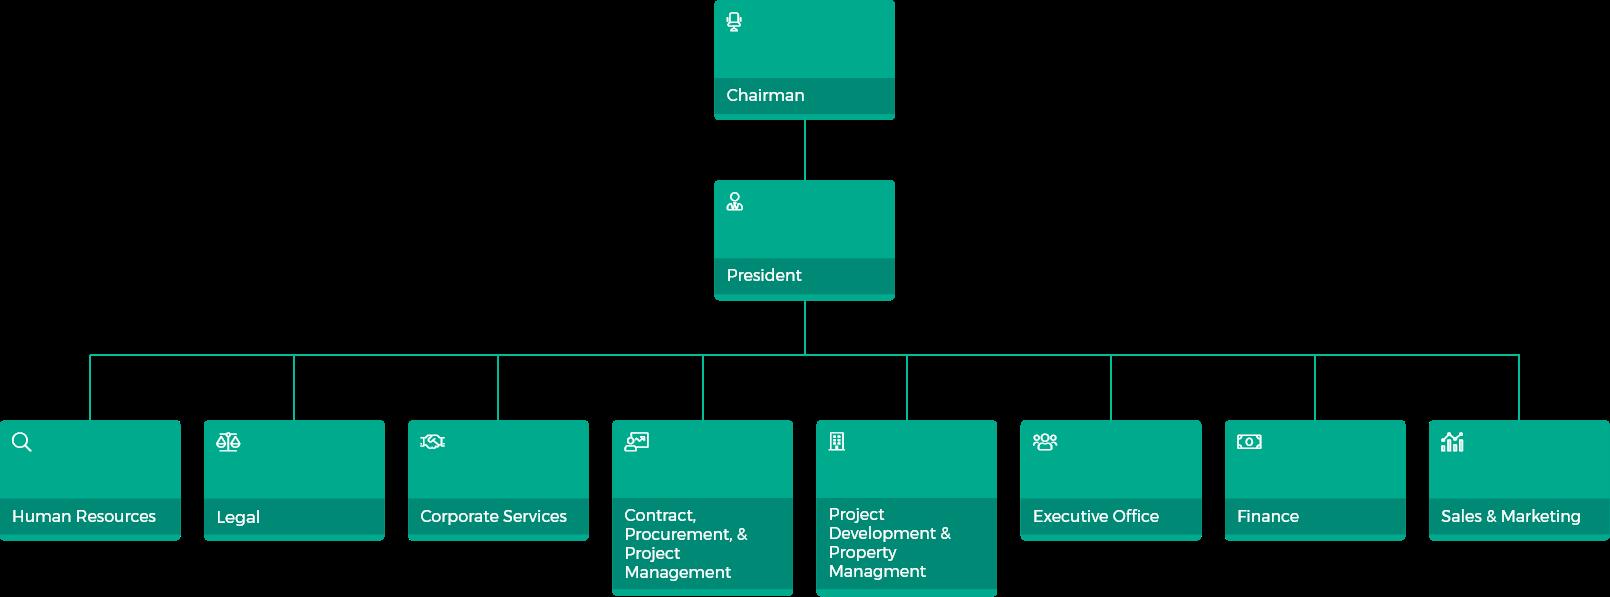 GERI Organizational Chart